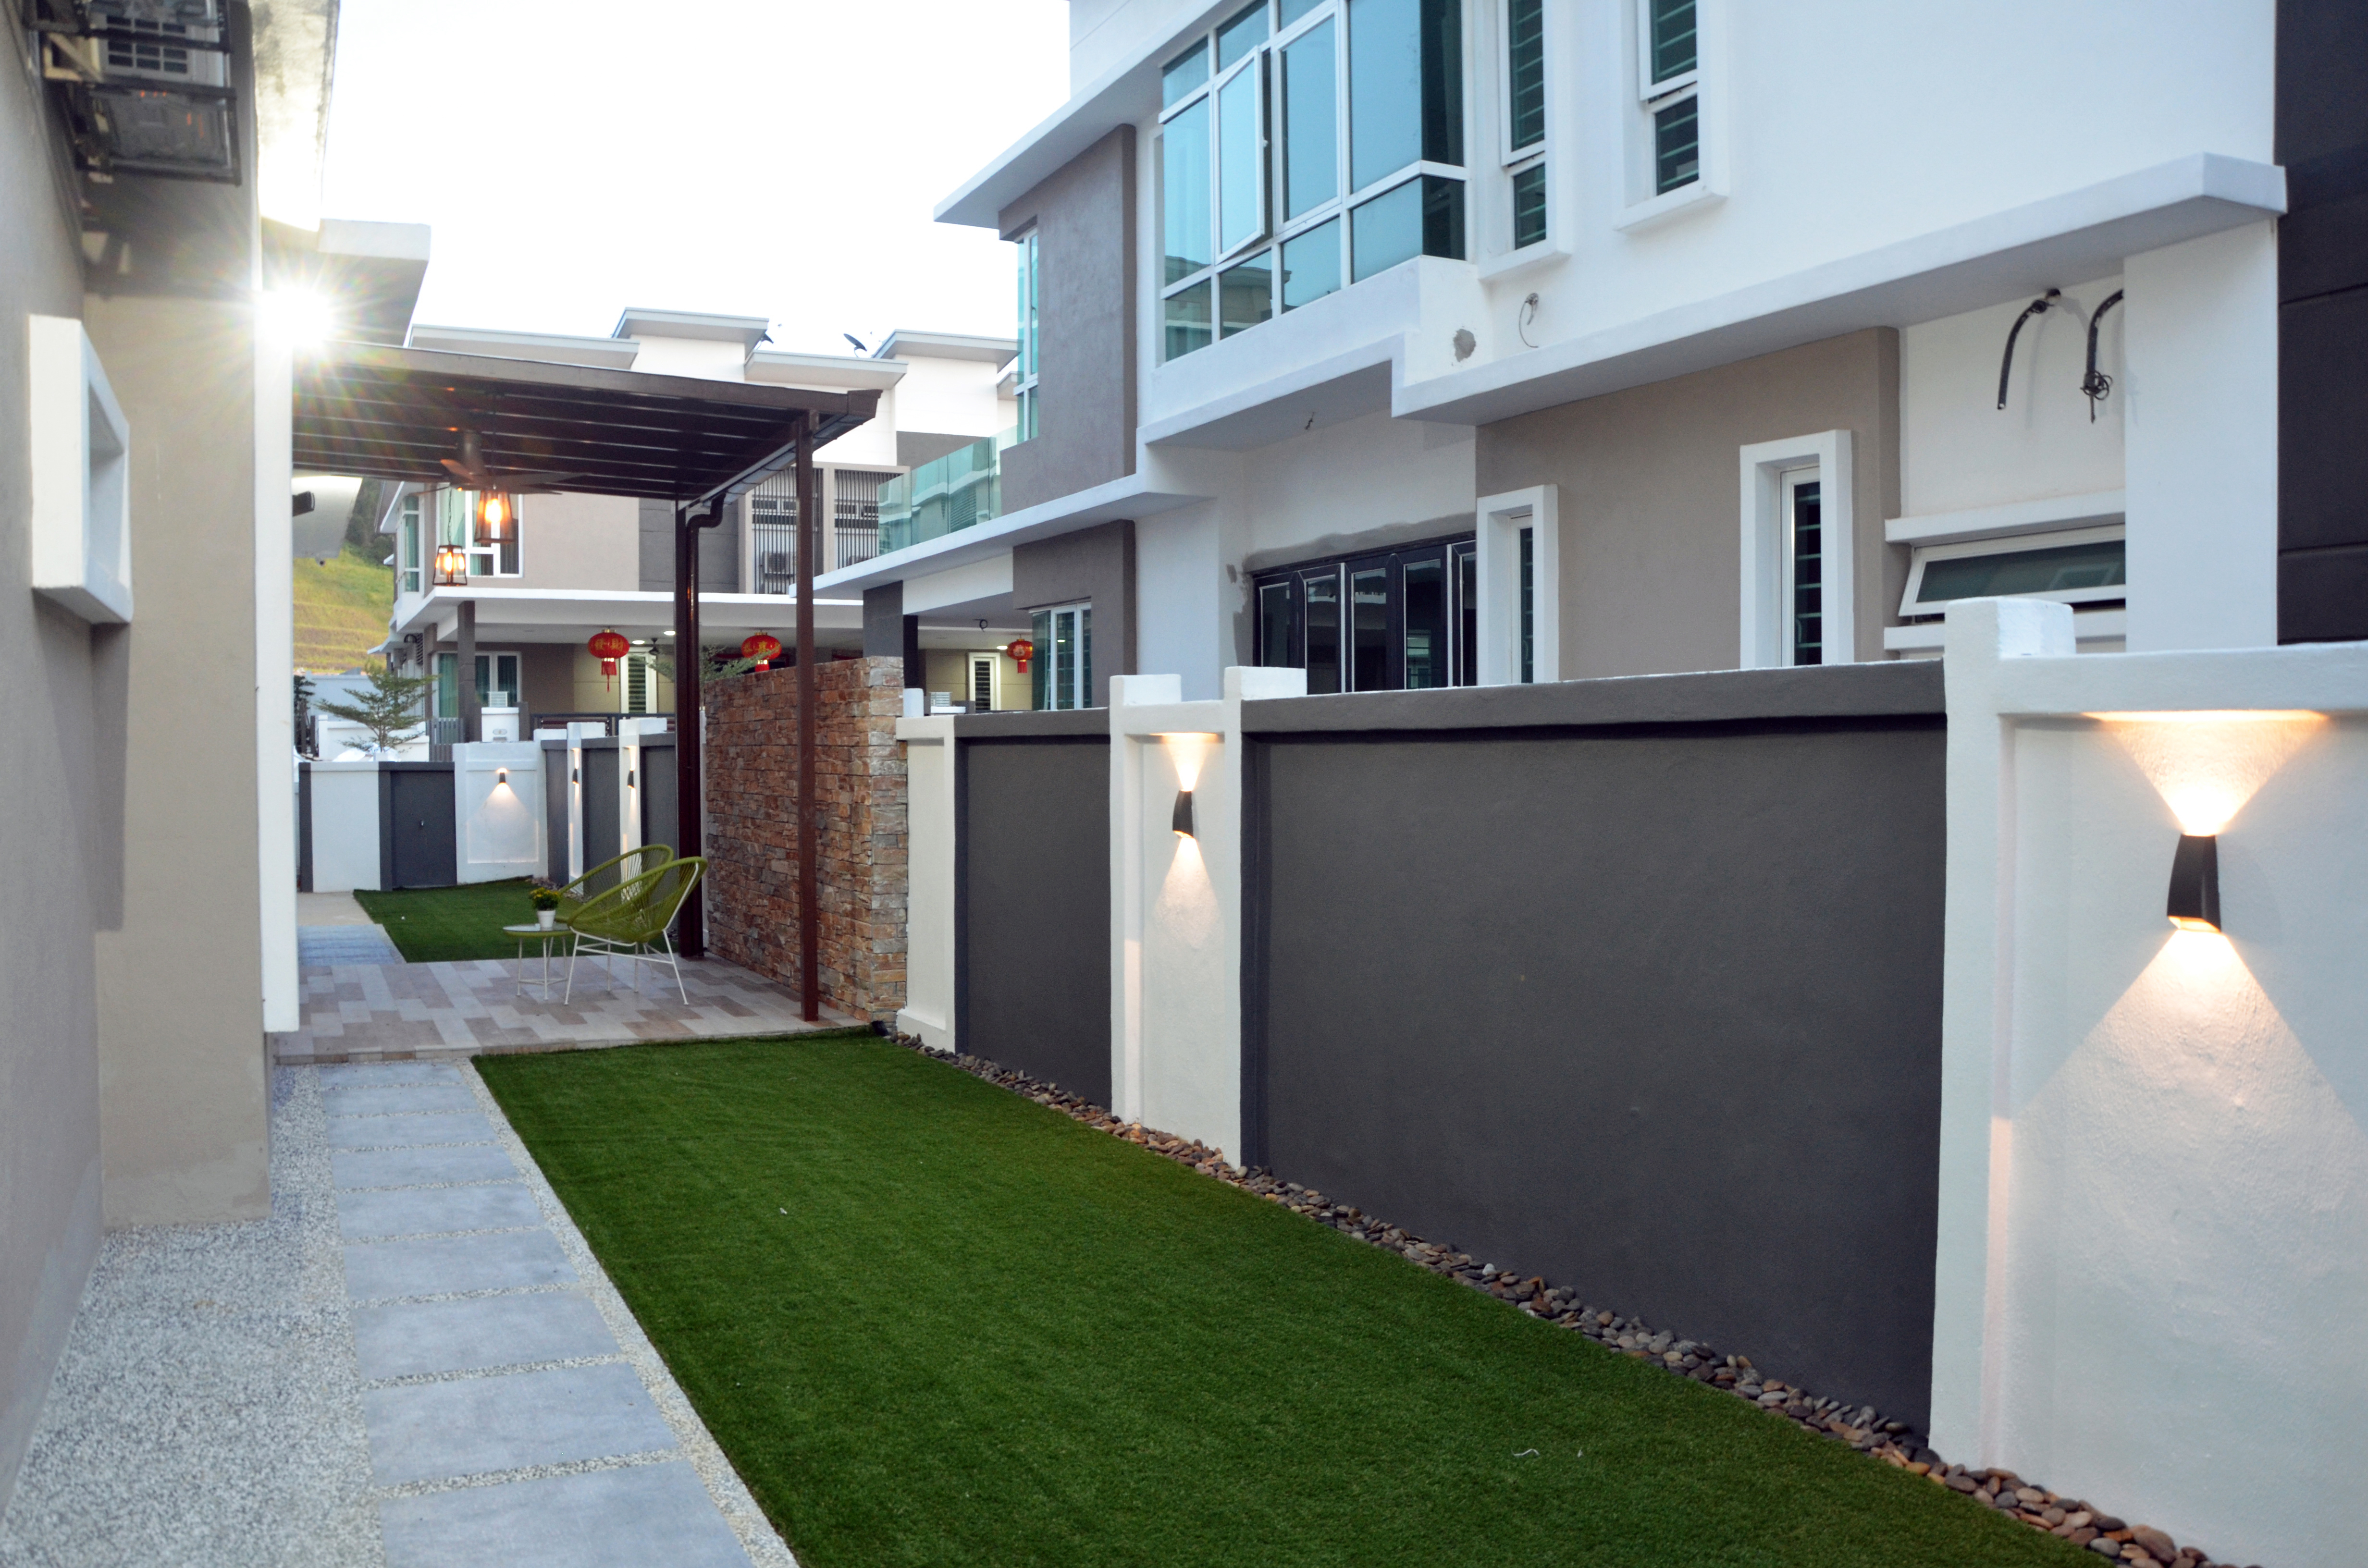 Yard Area